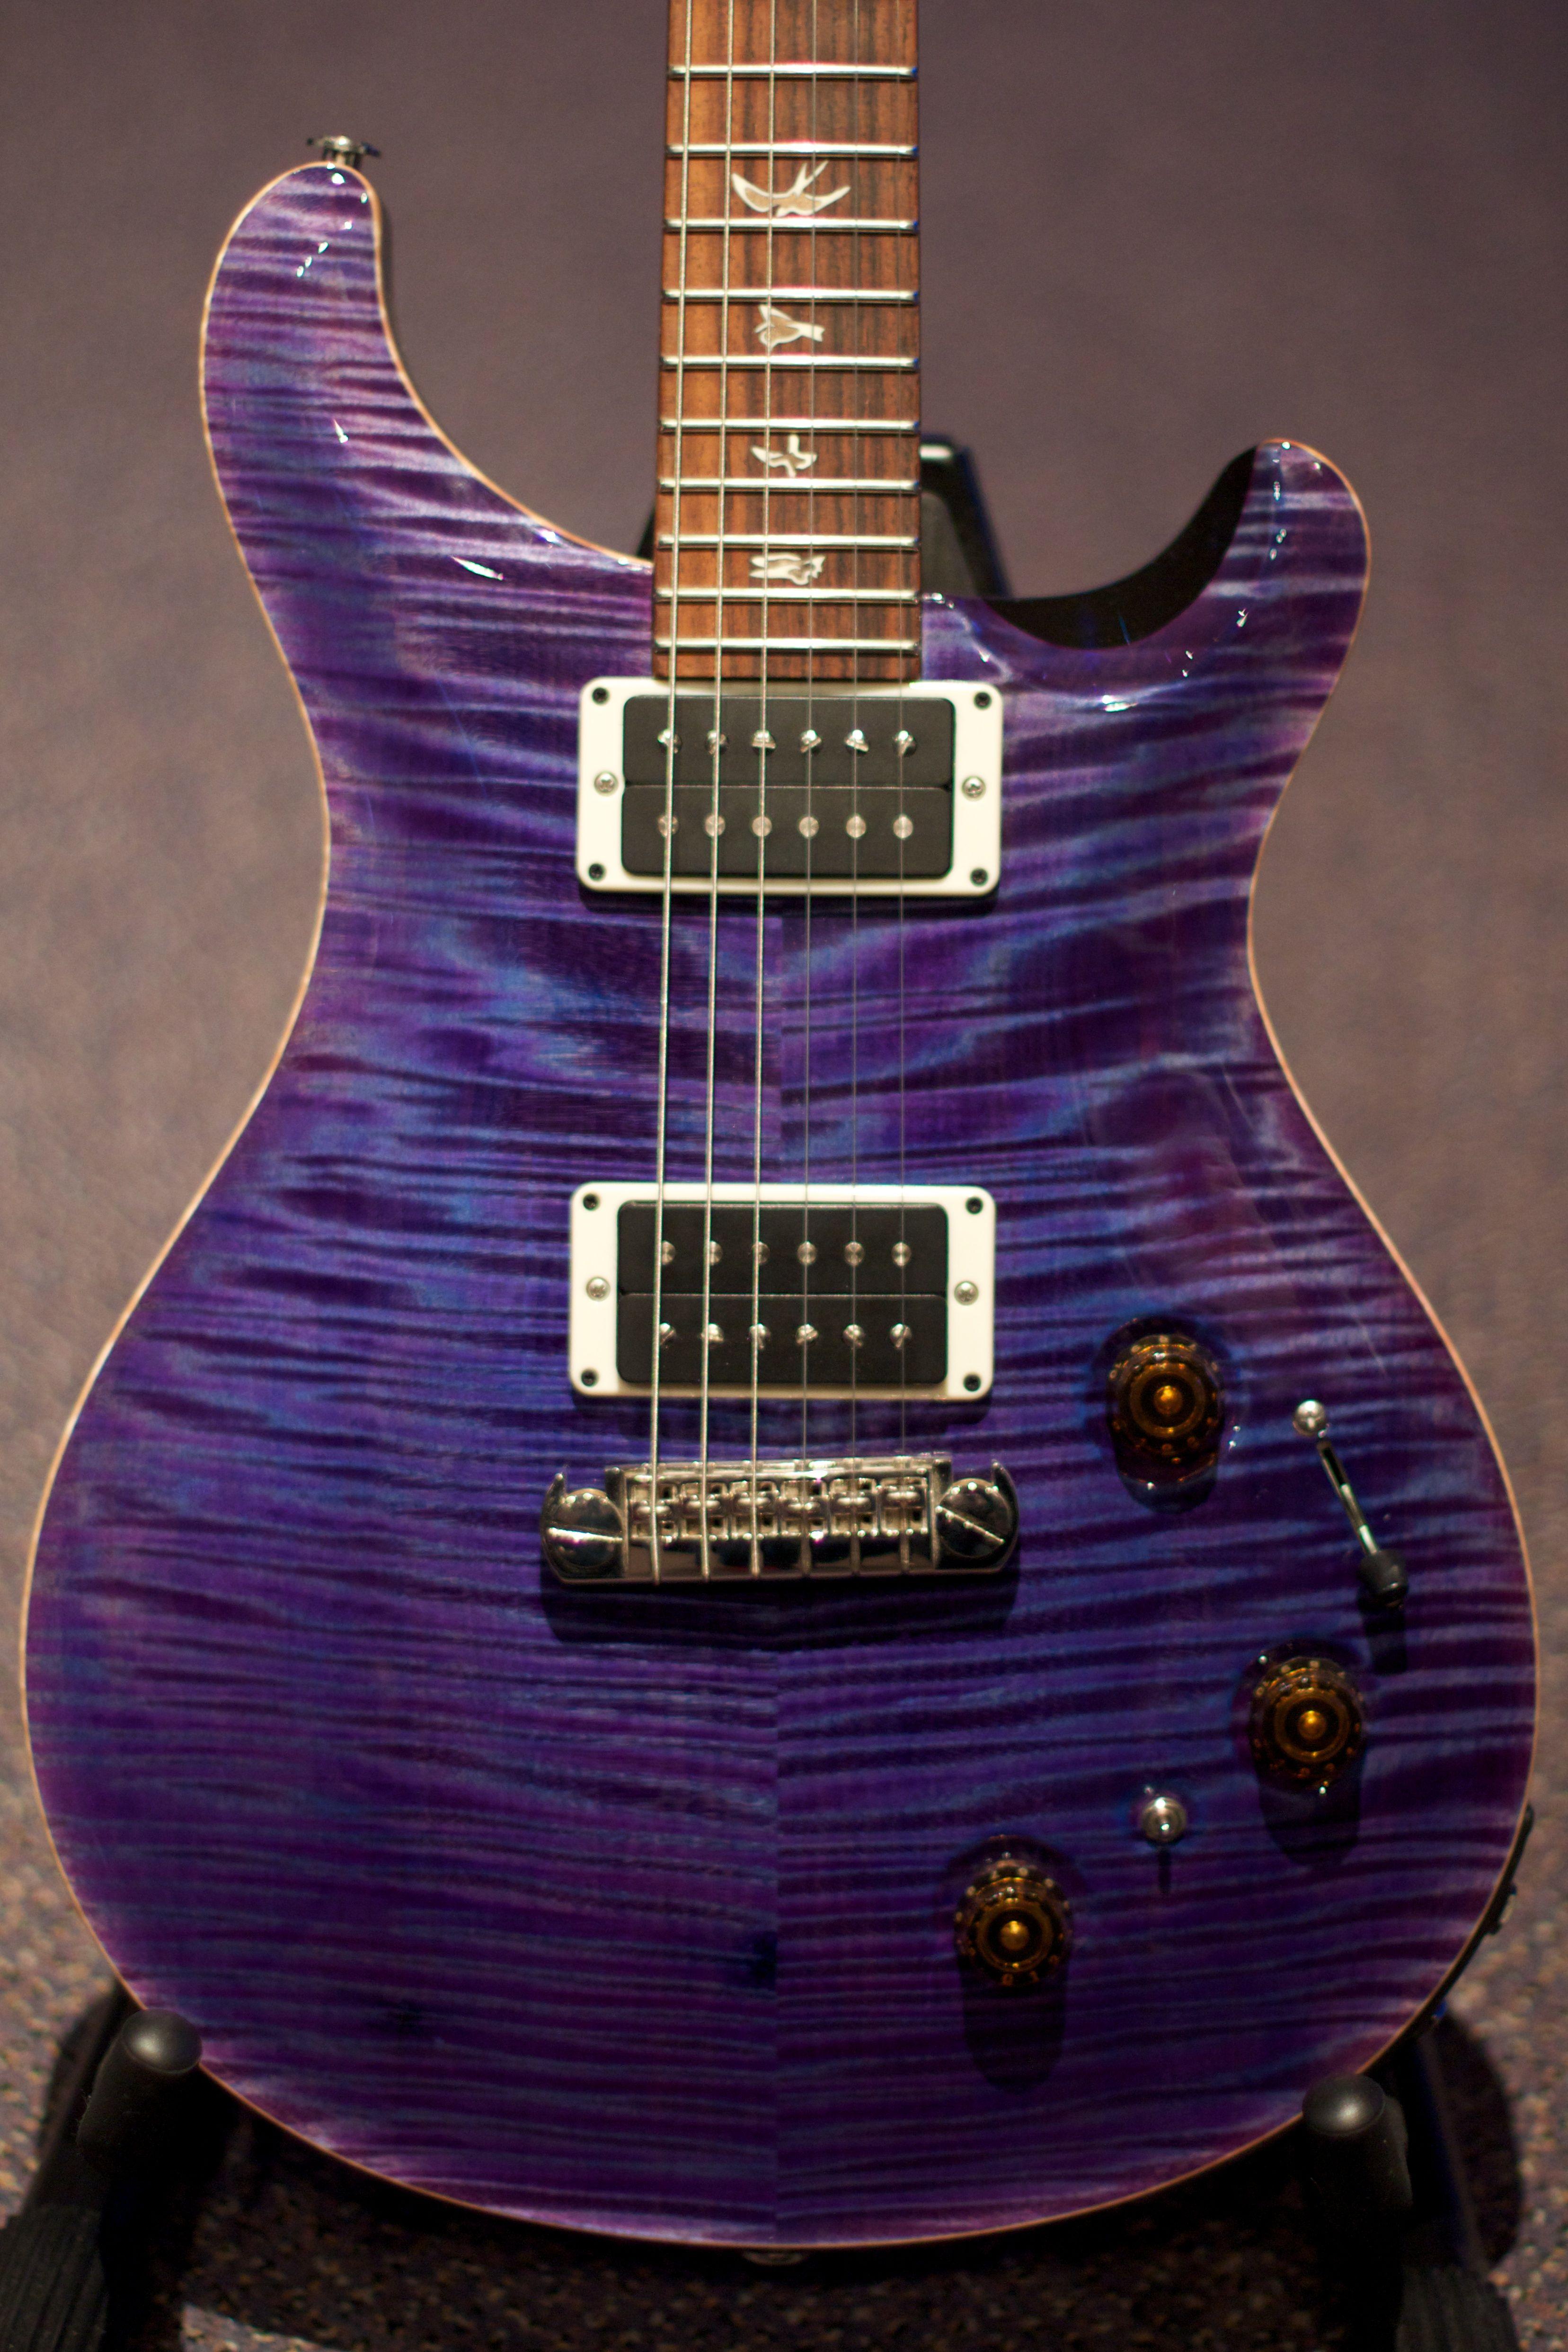 P22 Ten Top Light Purple PRS & P22 Ten Top Light Purple PRS | PRS Guitars | Pinterest | Light ... islam-shia.org